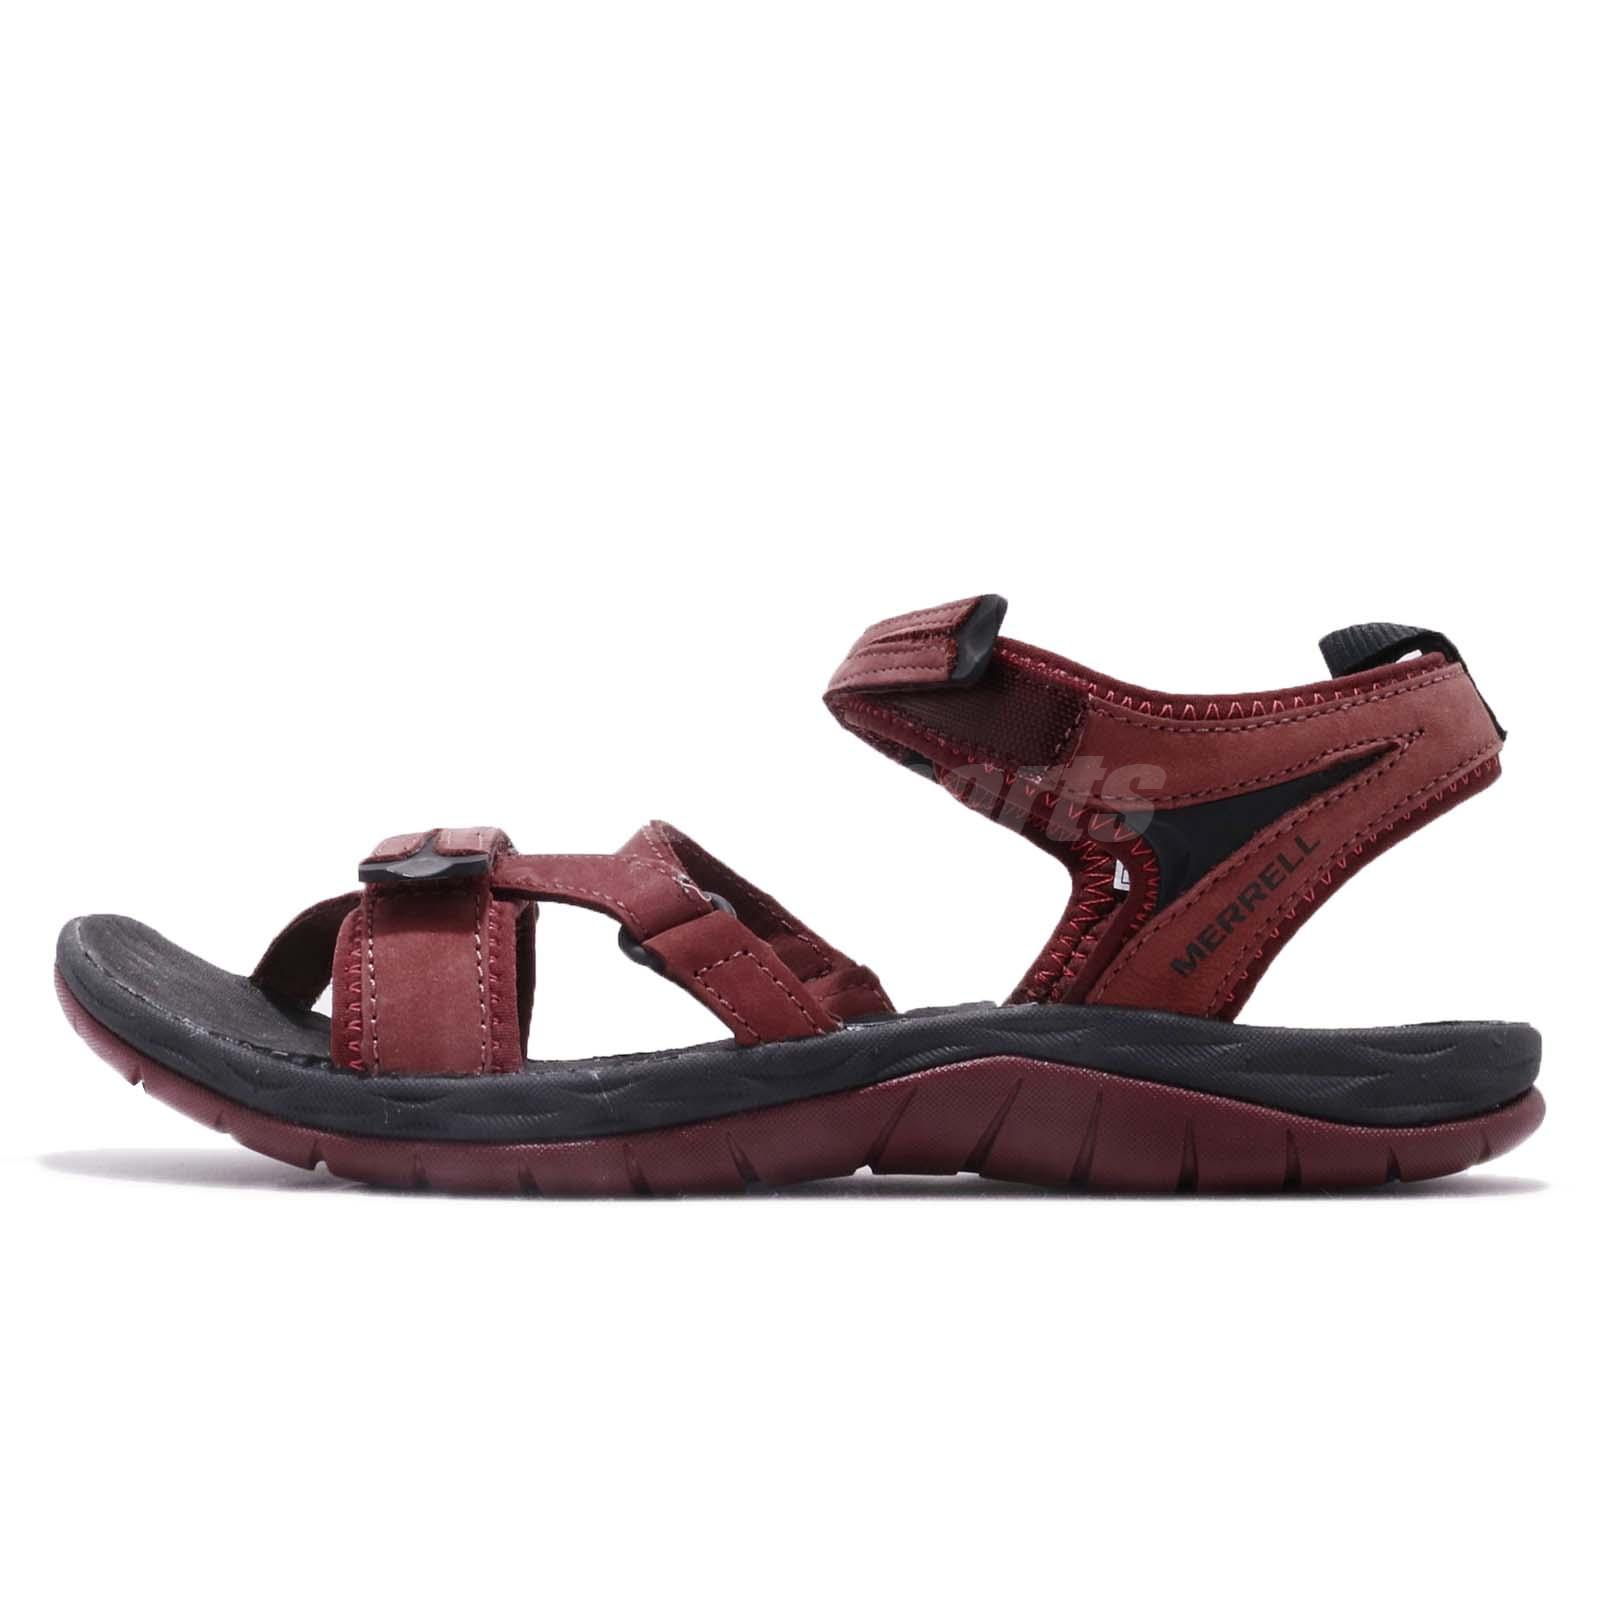 a972327ca4fc Details about Merrell Siren Strap Q2 Chocolate Truffle Black Women Sports  Sandals Shoes J12714